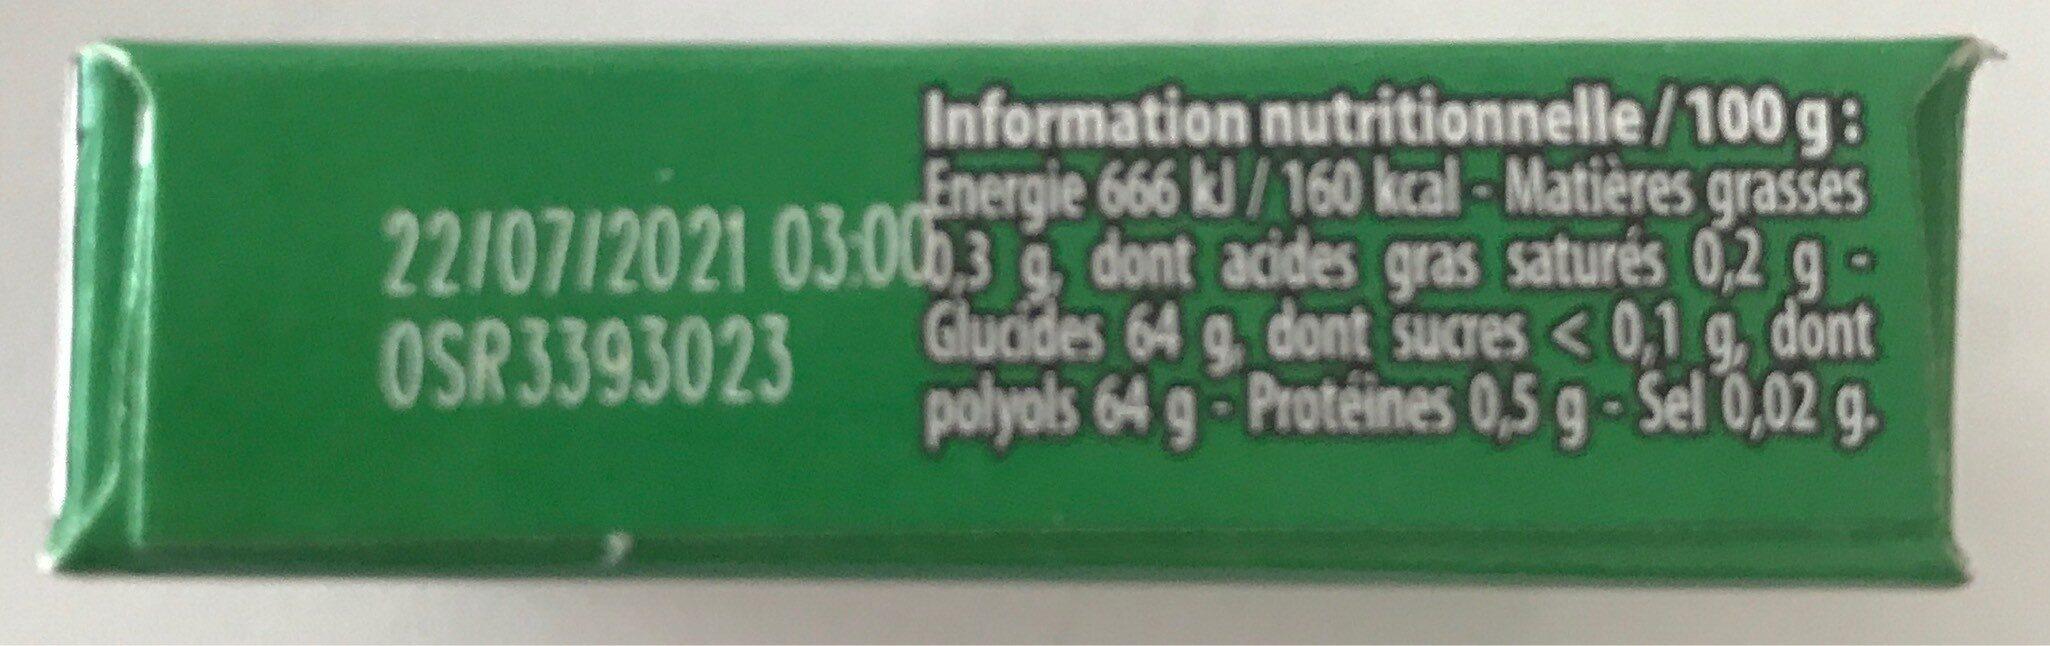 Chewing gum Green Fresh parfum menthe verte - Informations nutritionnelles